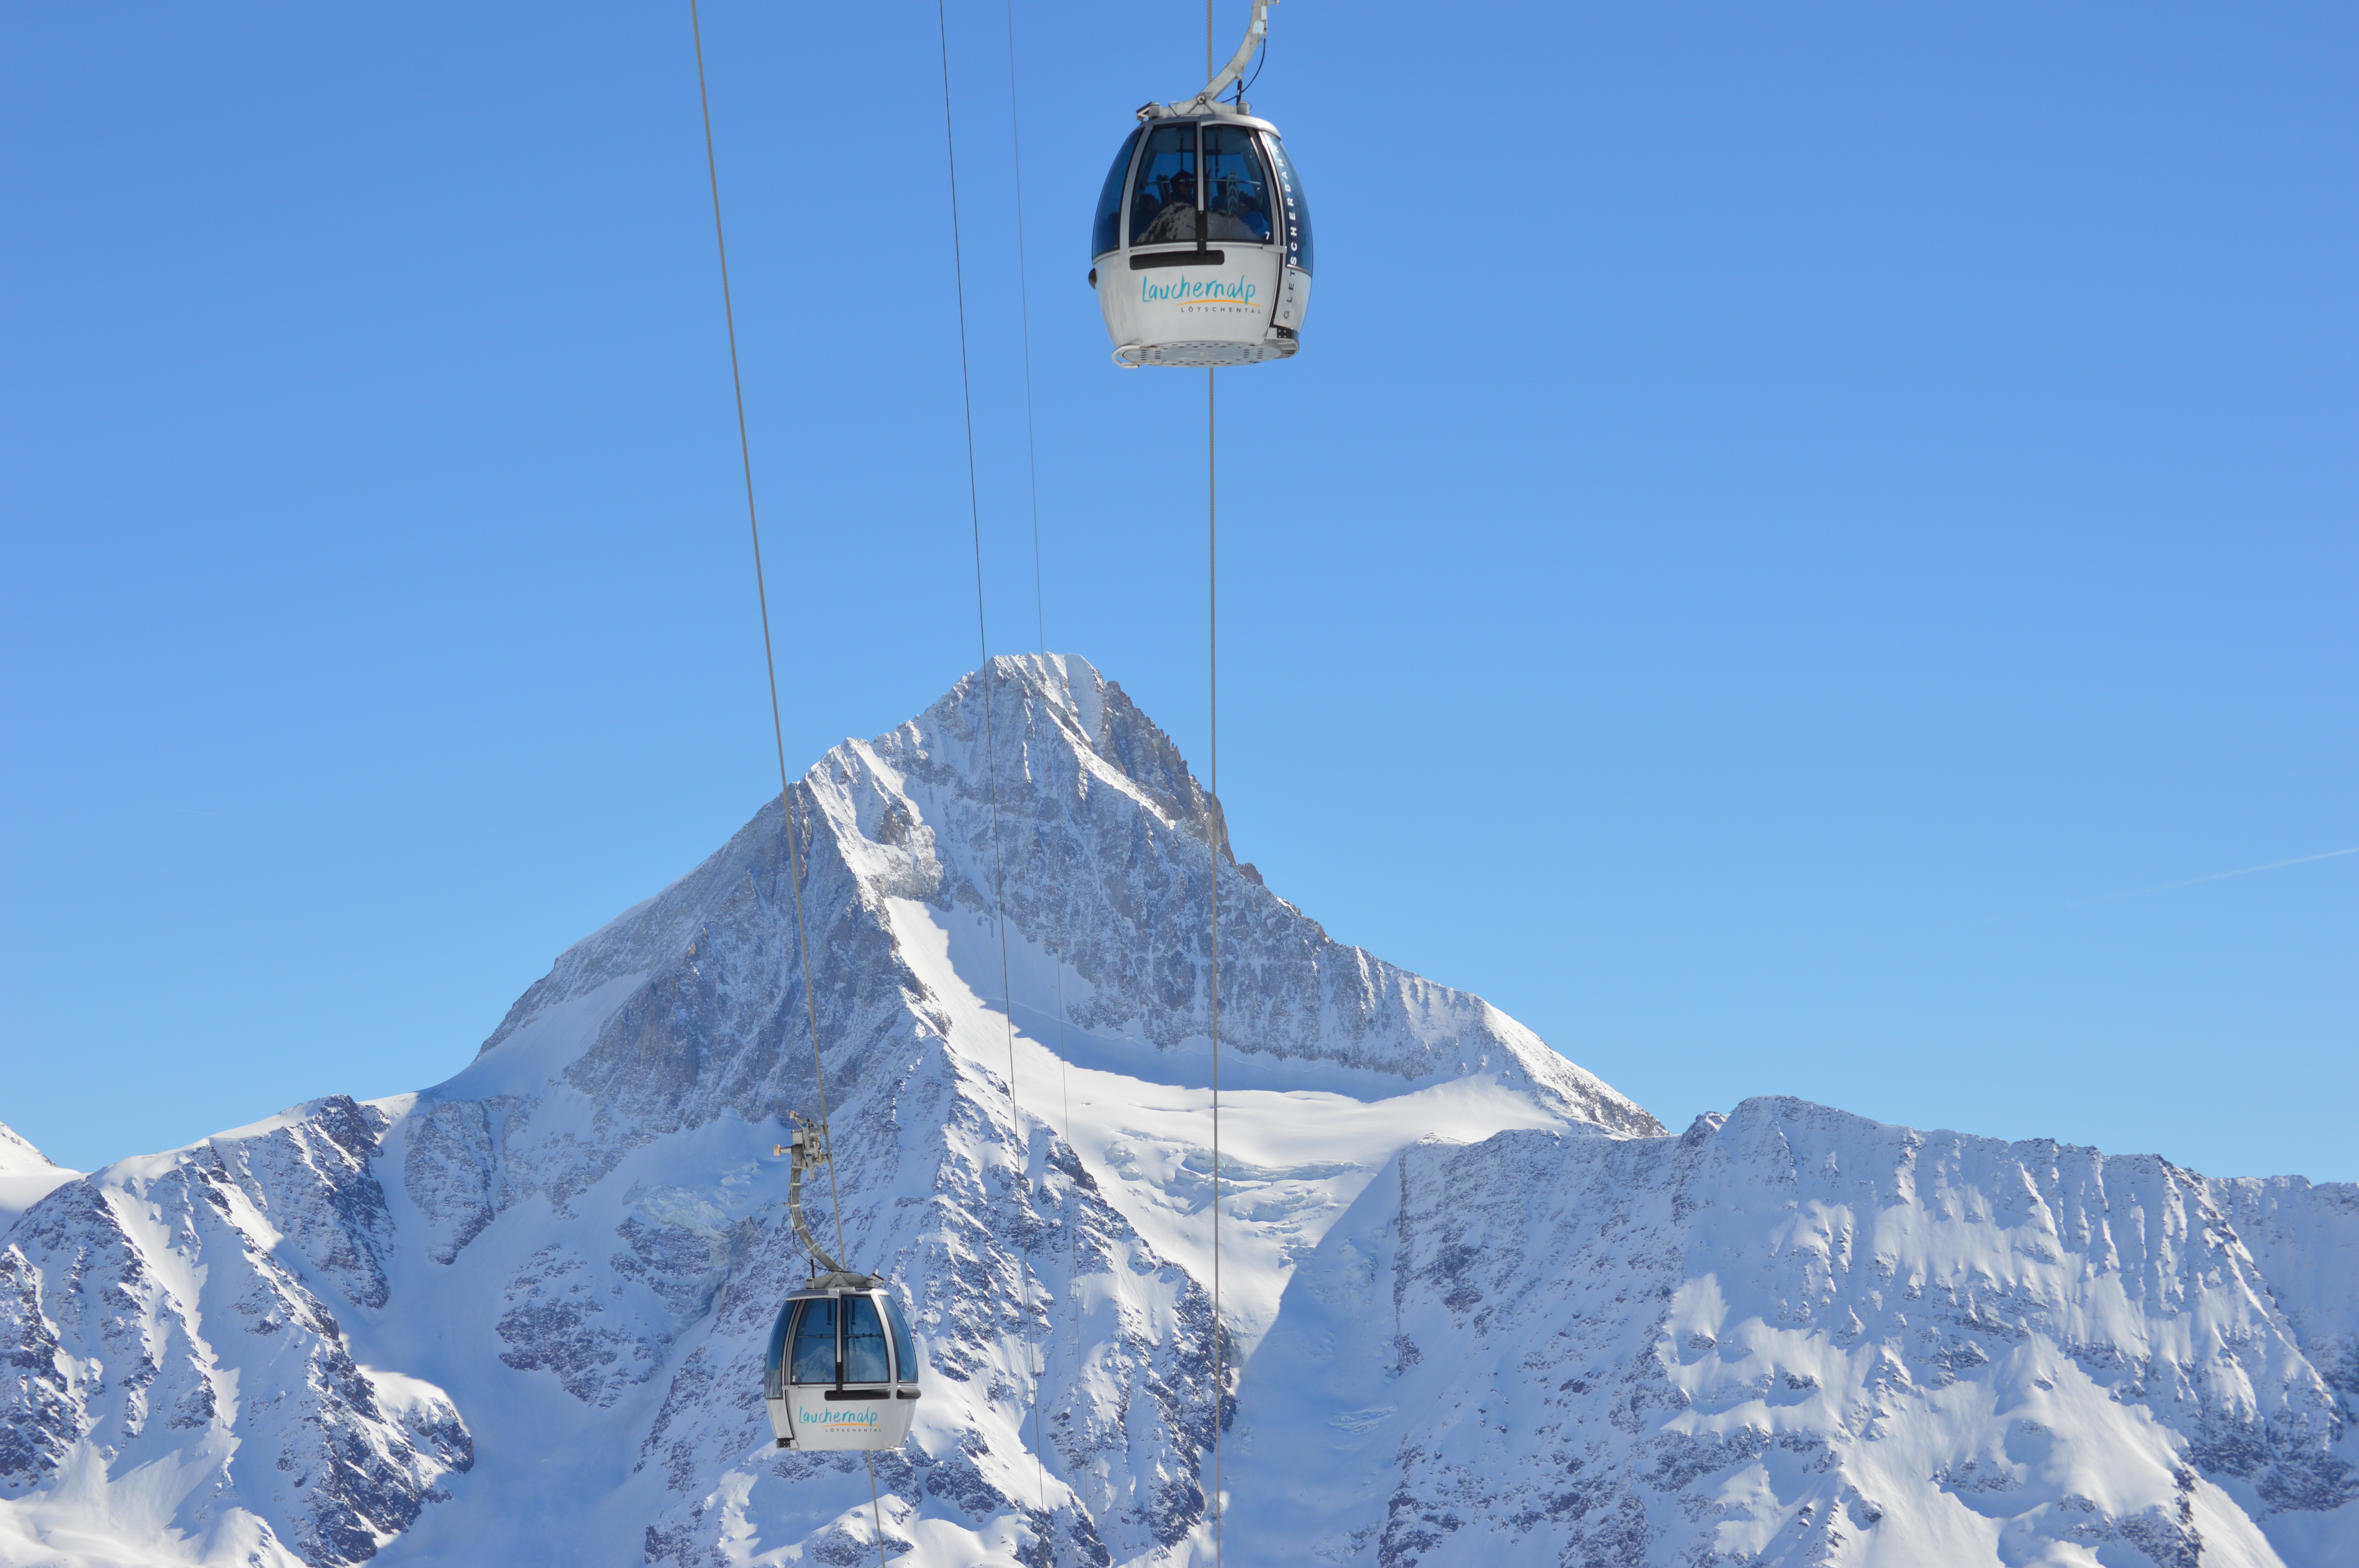 Saisoneröffnung Lauchernalp Bergbahnen